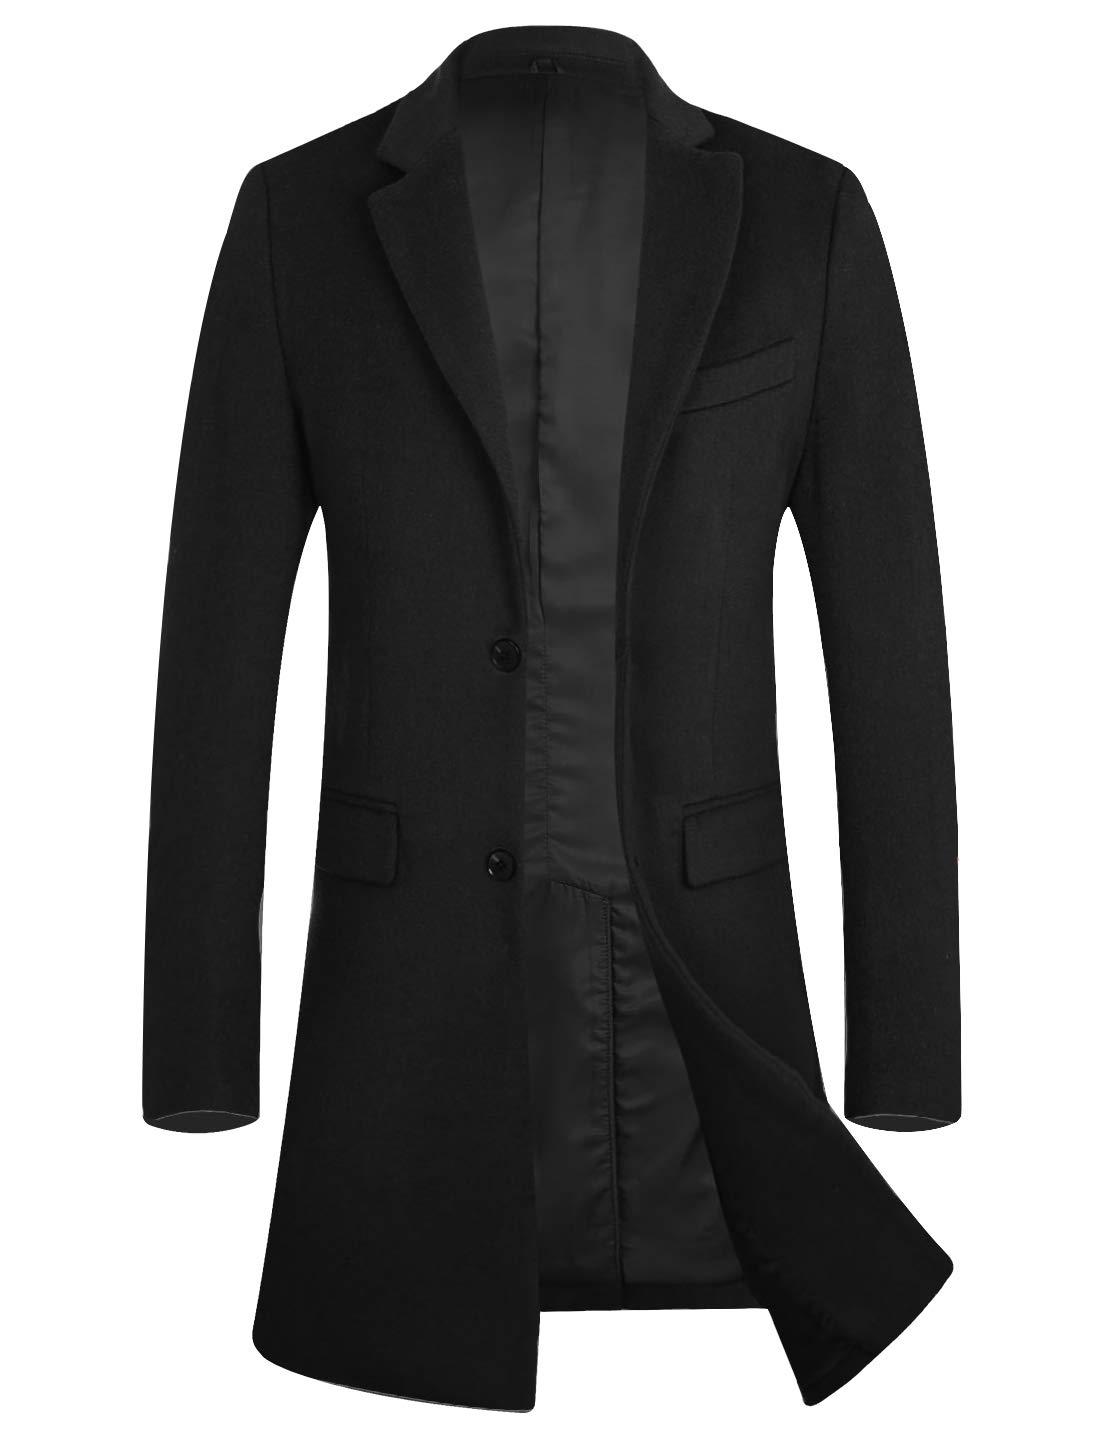 APTRO Men's Wool Blend Trench Coat Above Knee Winter Overcoat 1702 Black XL by APTRO